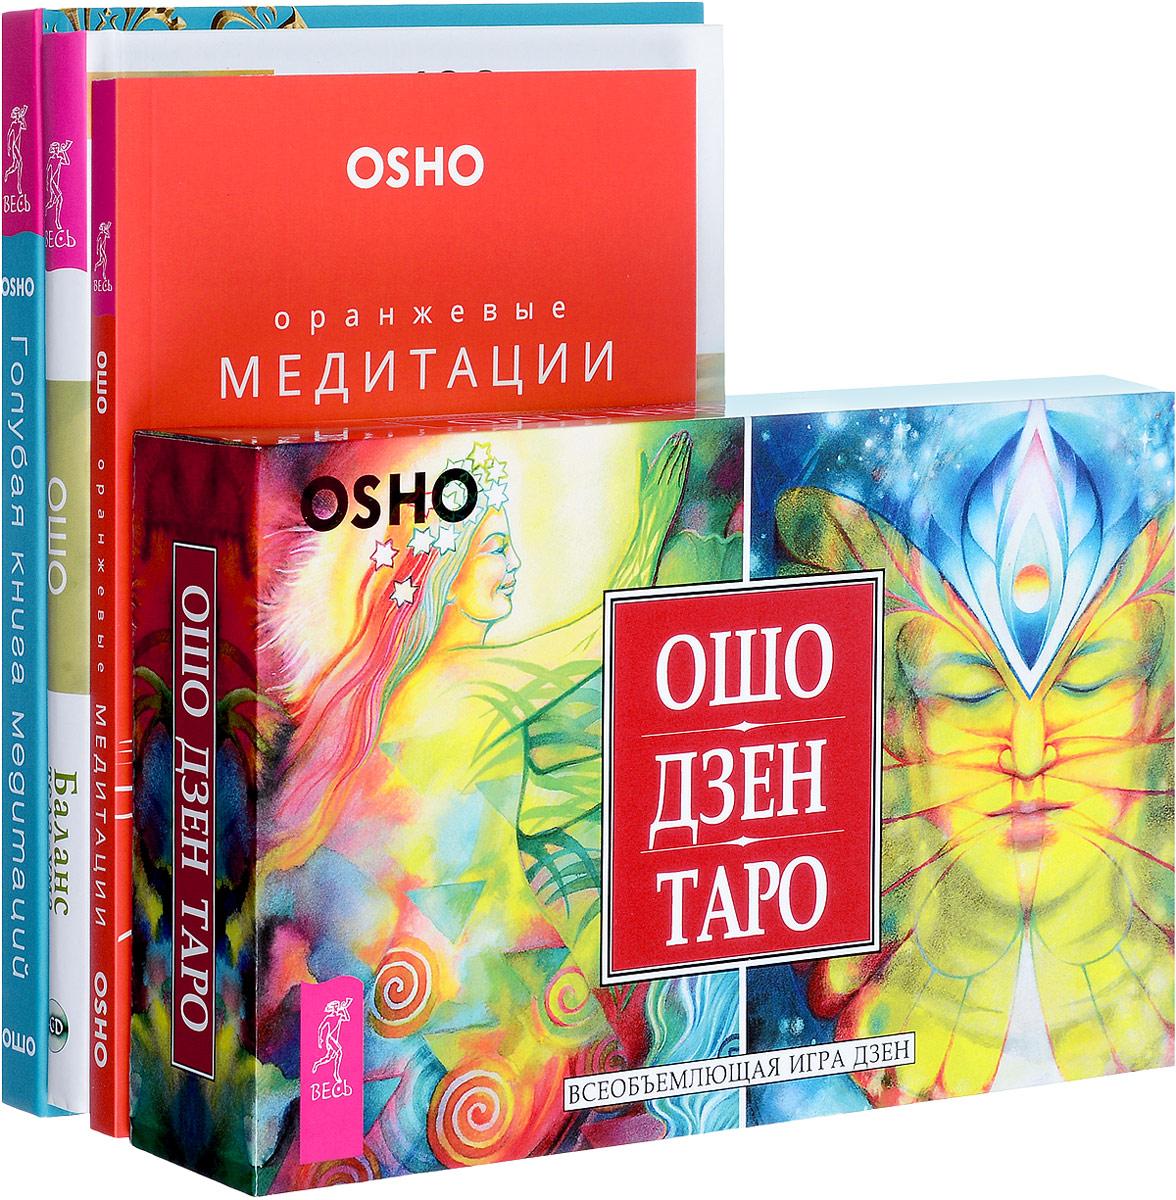 Баланс тела - ума. Оранжевые медитации. Голубая книга медитаций. Ошо Дзен Таро (комплект из 4 книг + 79 карт). Ошо